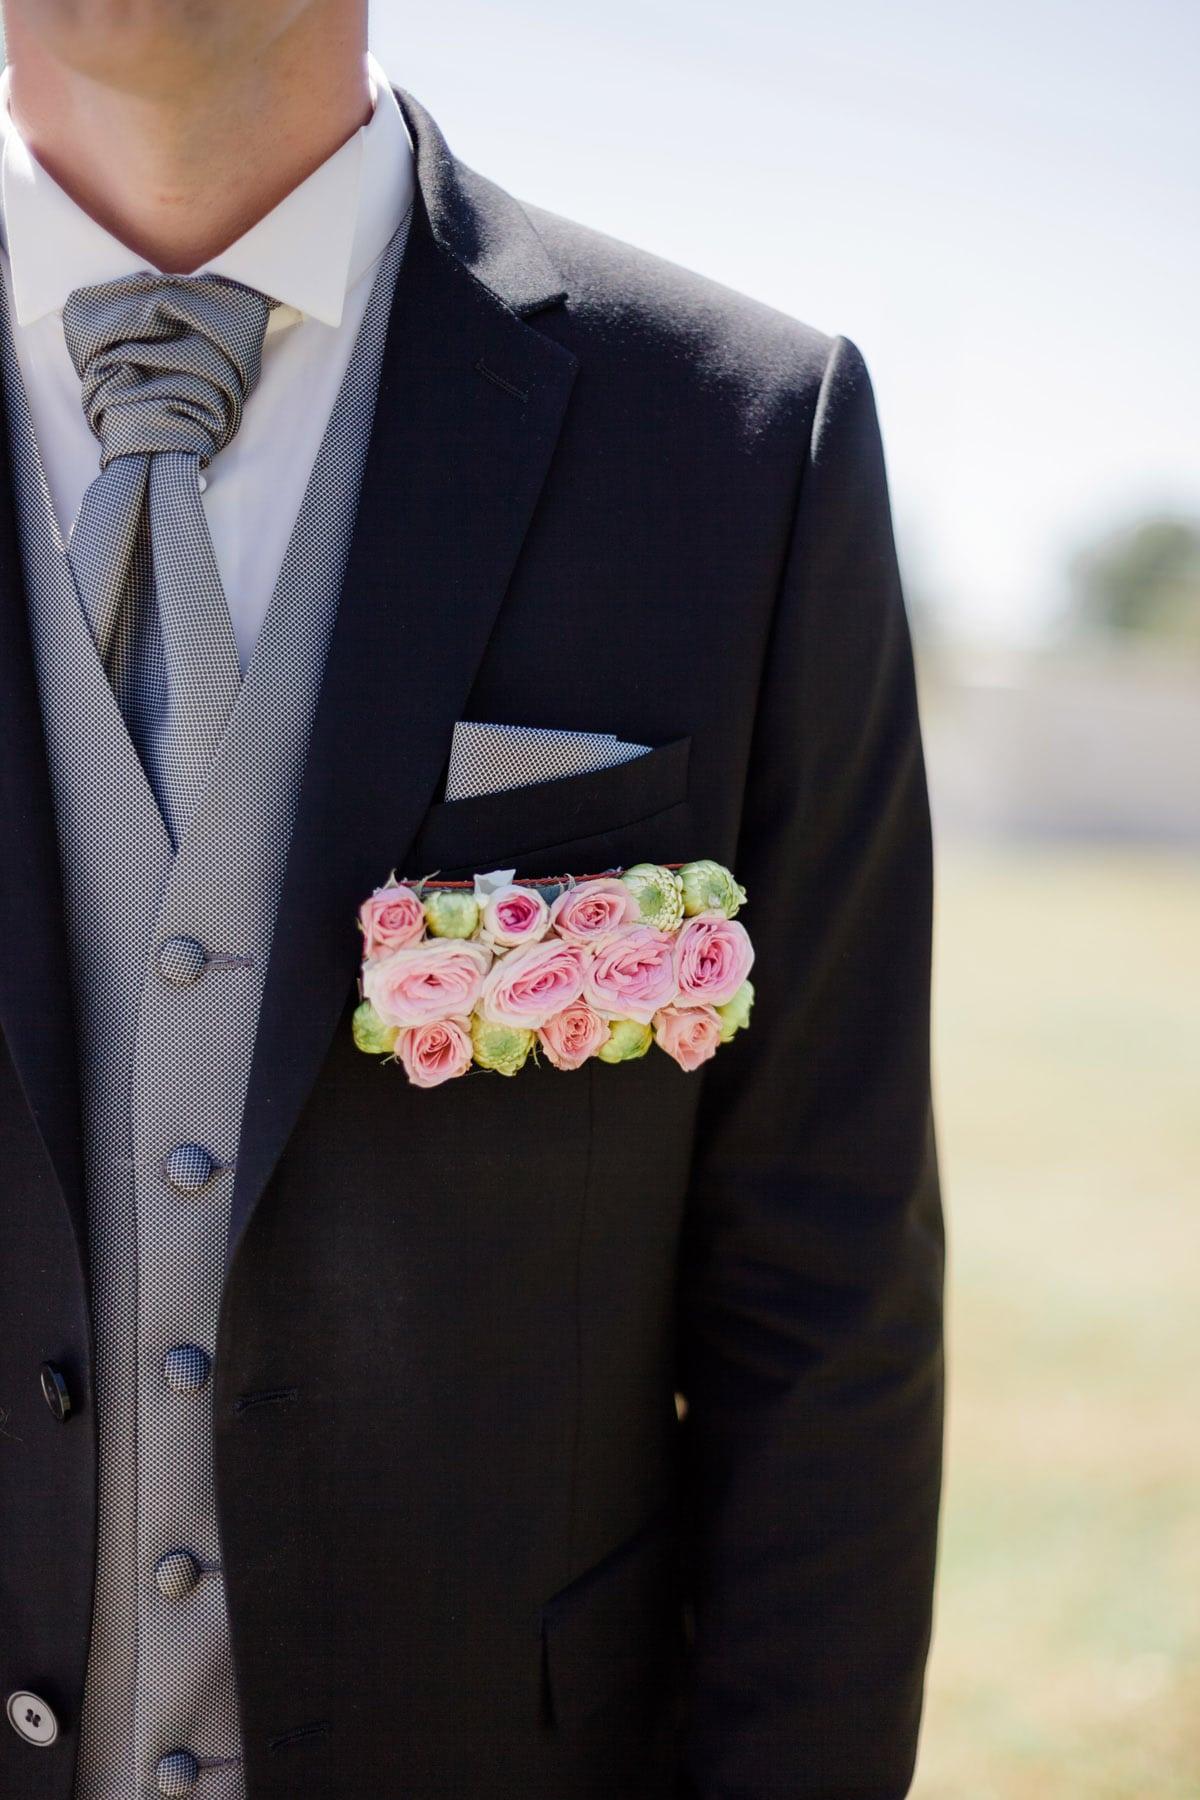 photographe mariage bordeaux landes fineart francais sarah miramon blog 06